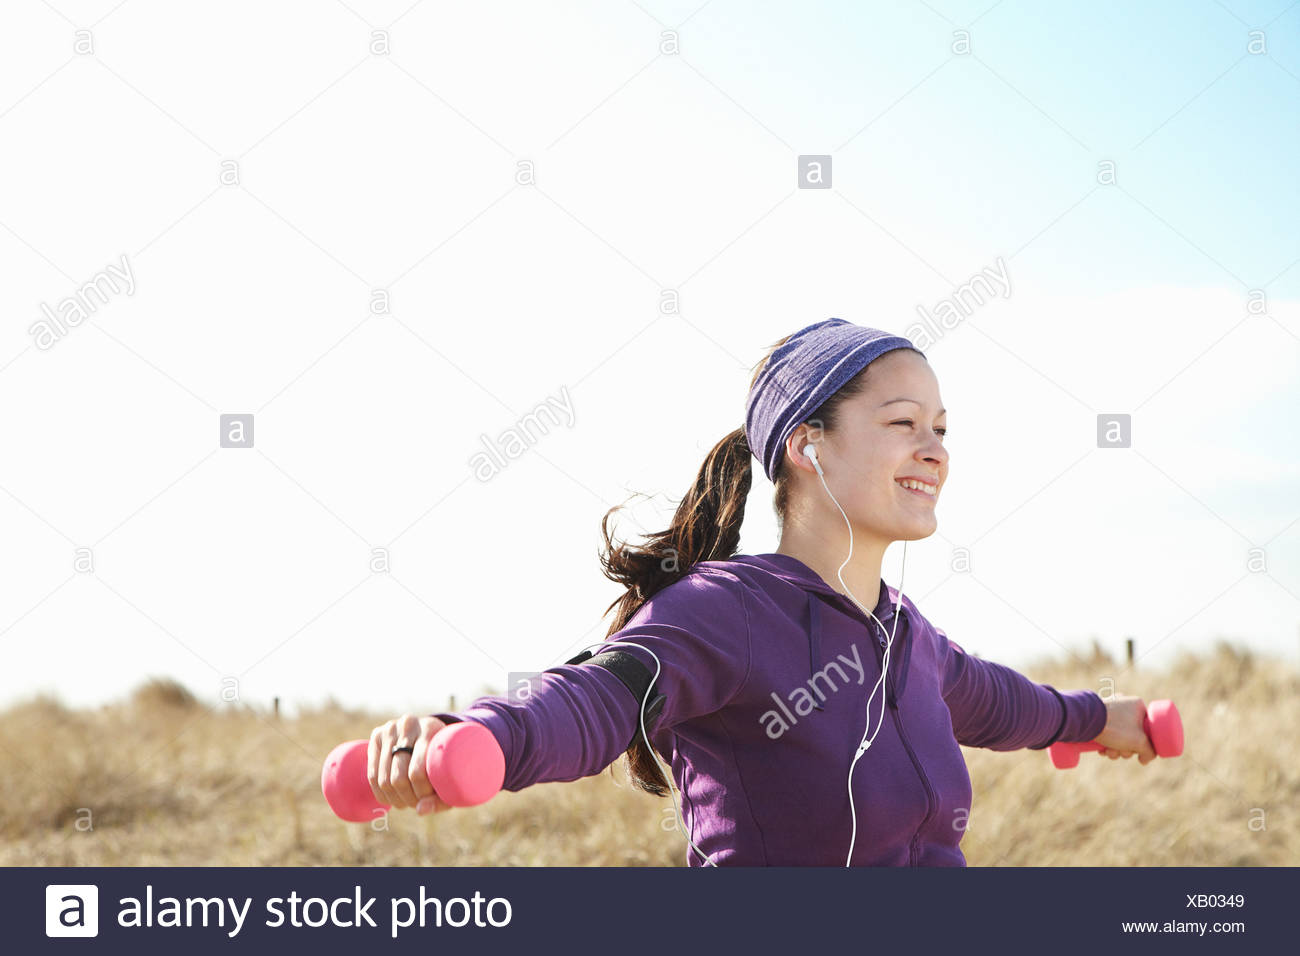 Smiling woman lifting dumbbells outside - Stock Image